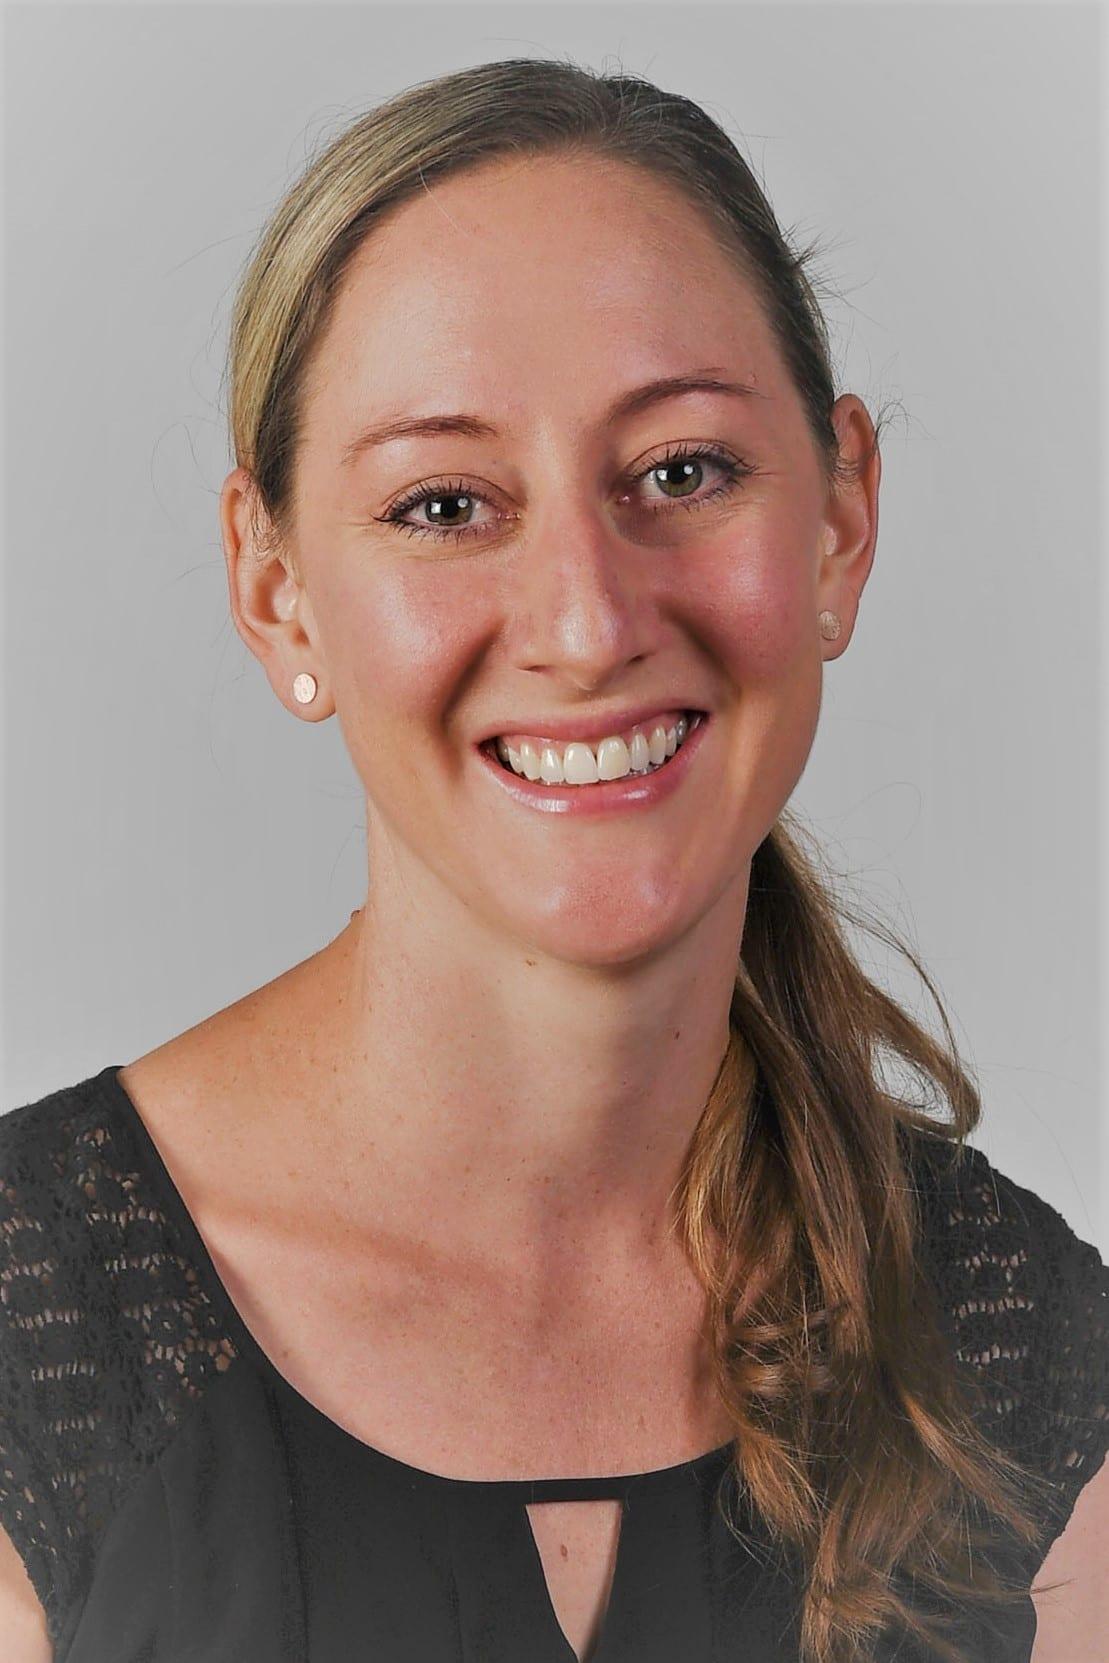 Laura Holloway - Media Education portrait - enhanced